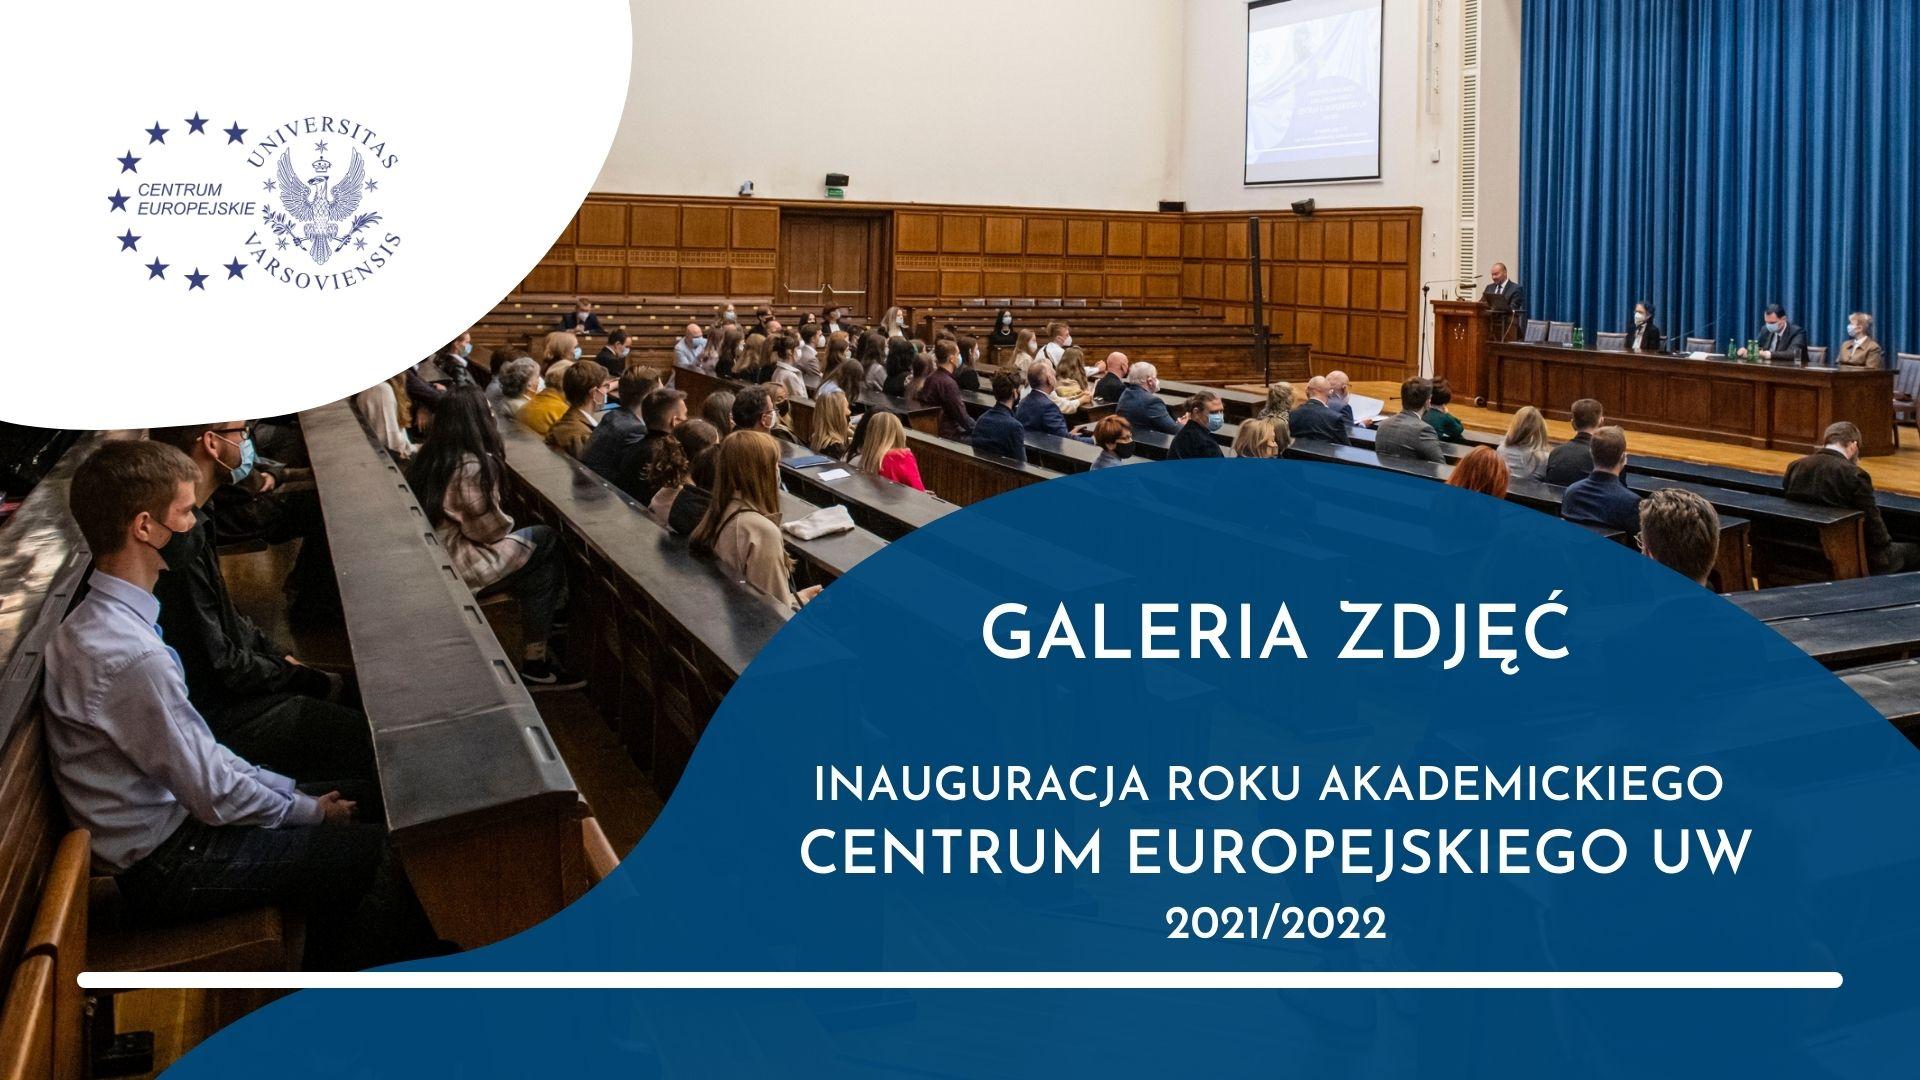 Slajder_Galeria ZInauguracji Roku Akademickiego 2021:2022 CE UW